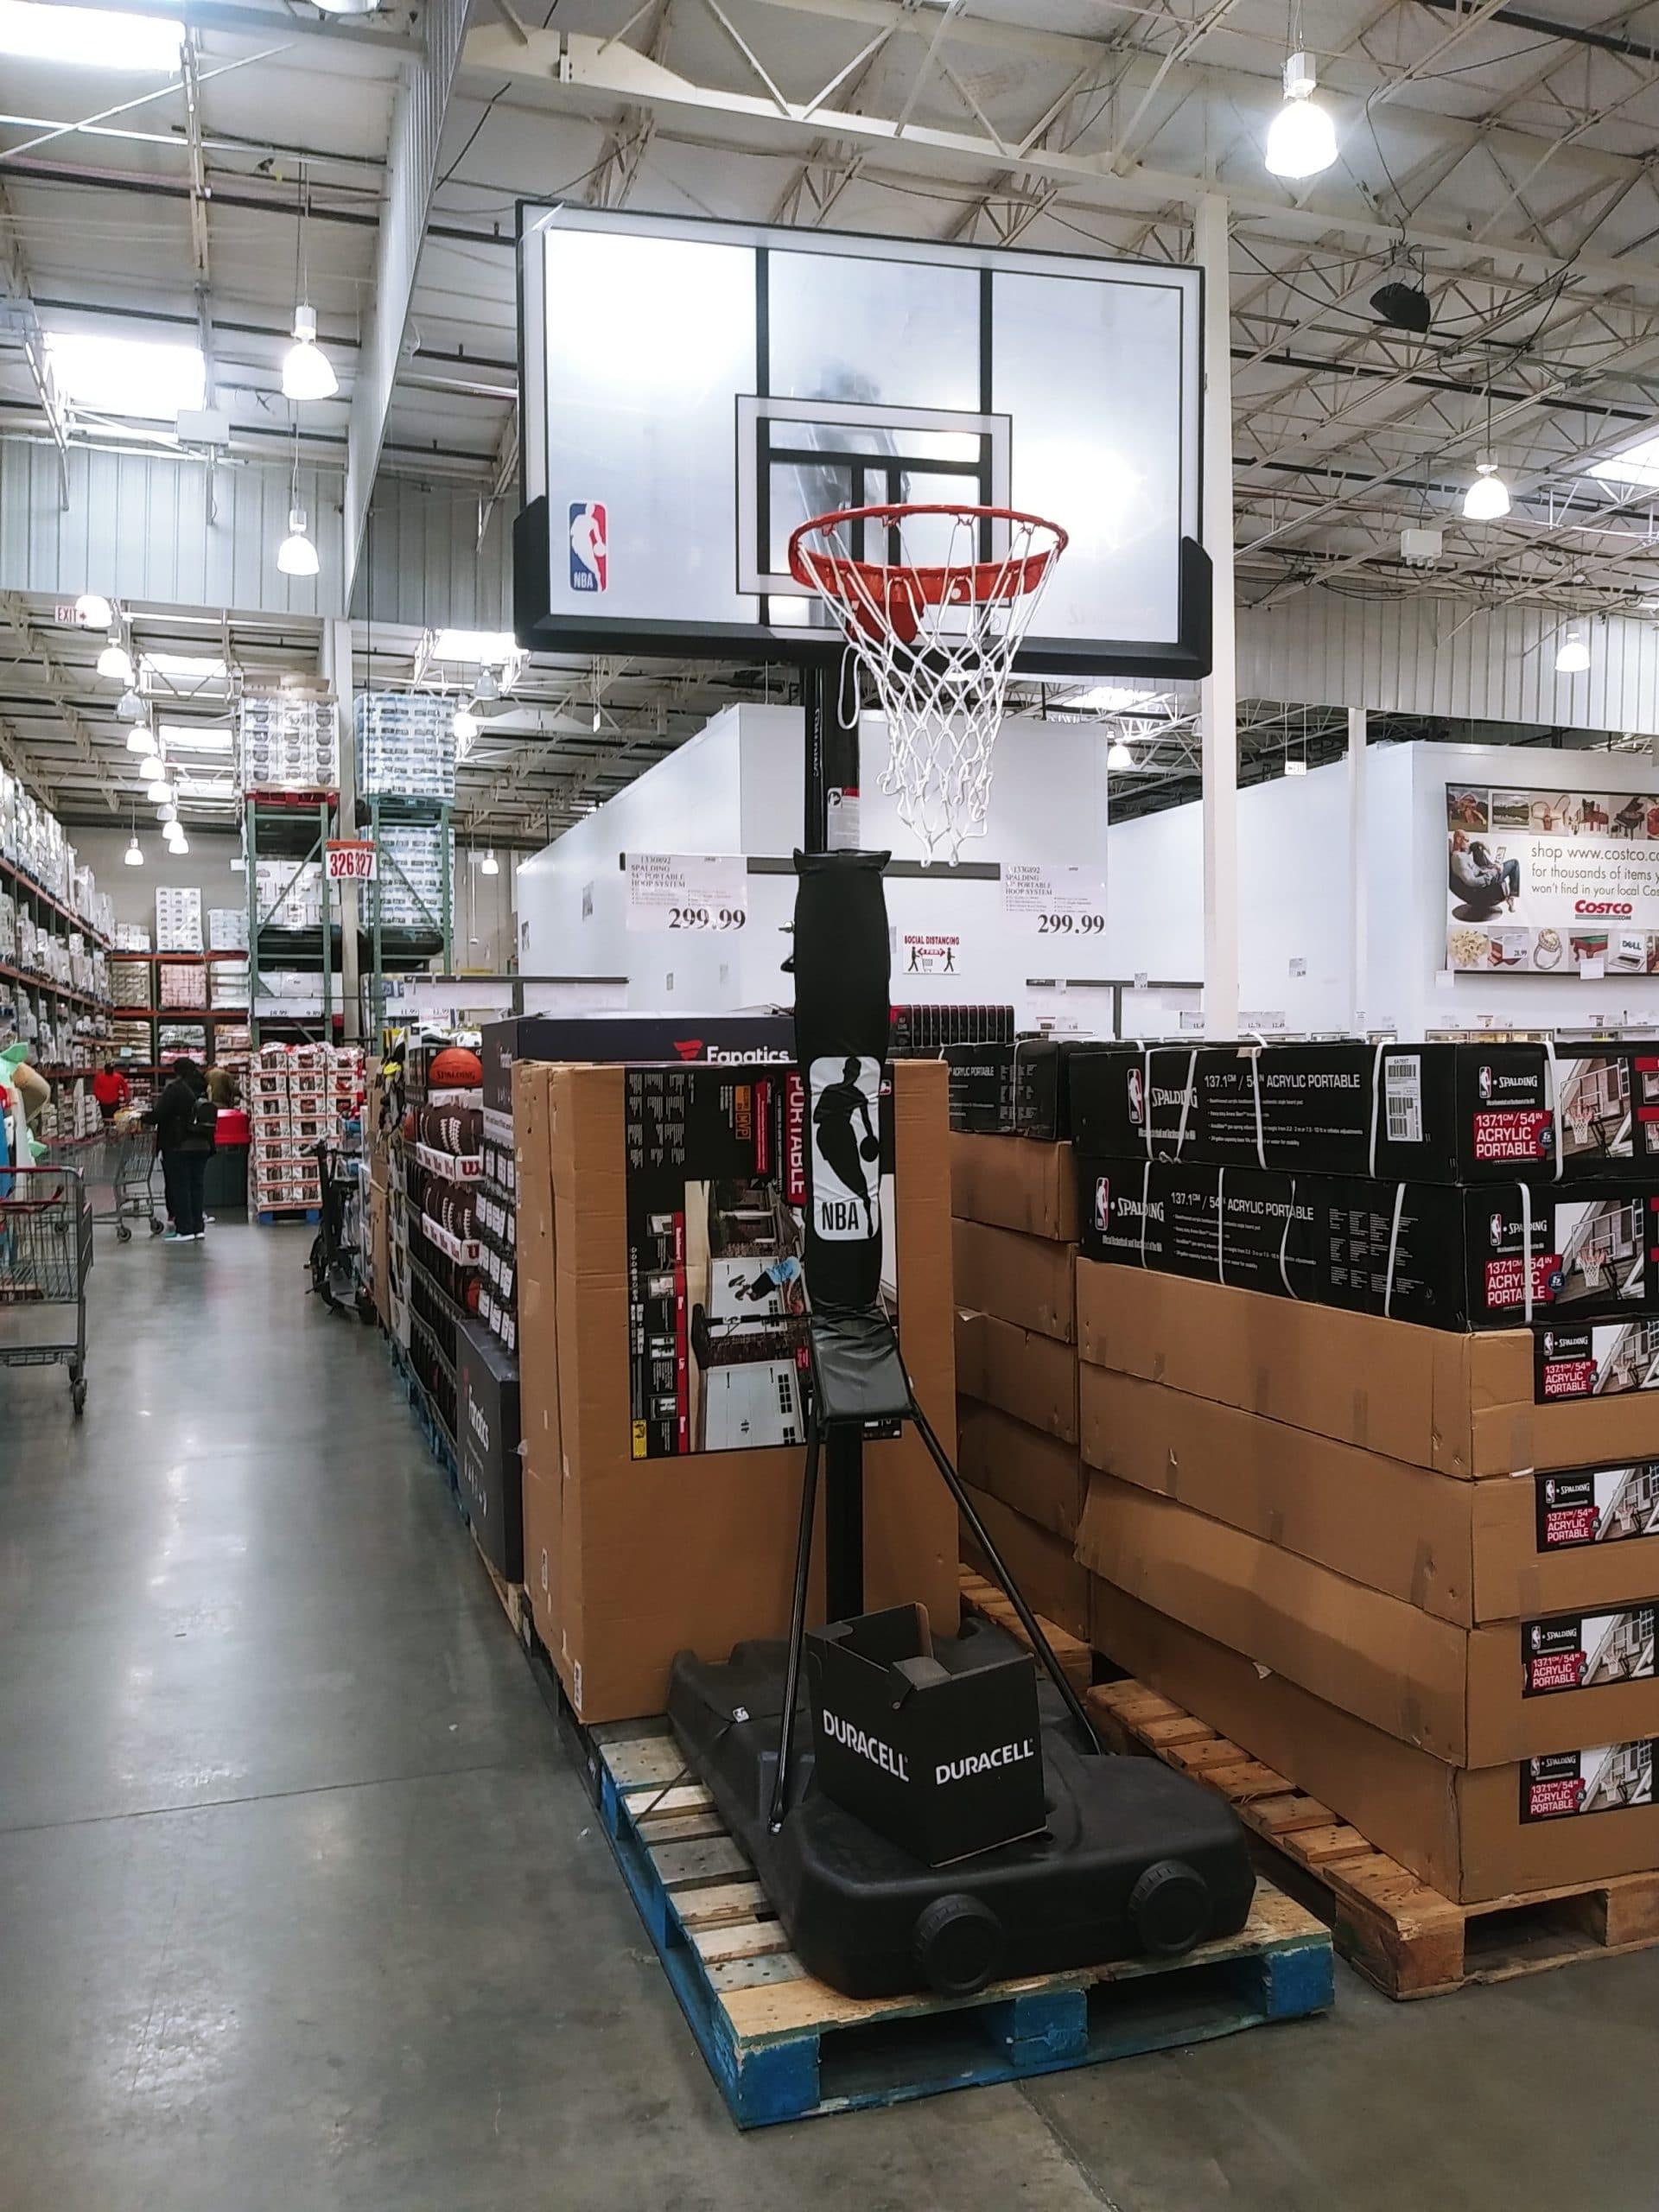 Spalding Portable Basketball Hoop $299.99